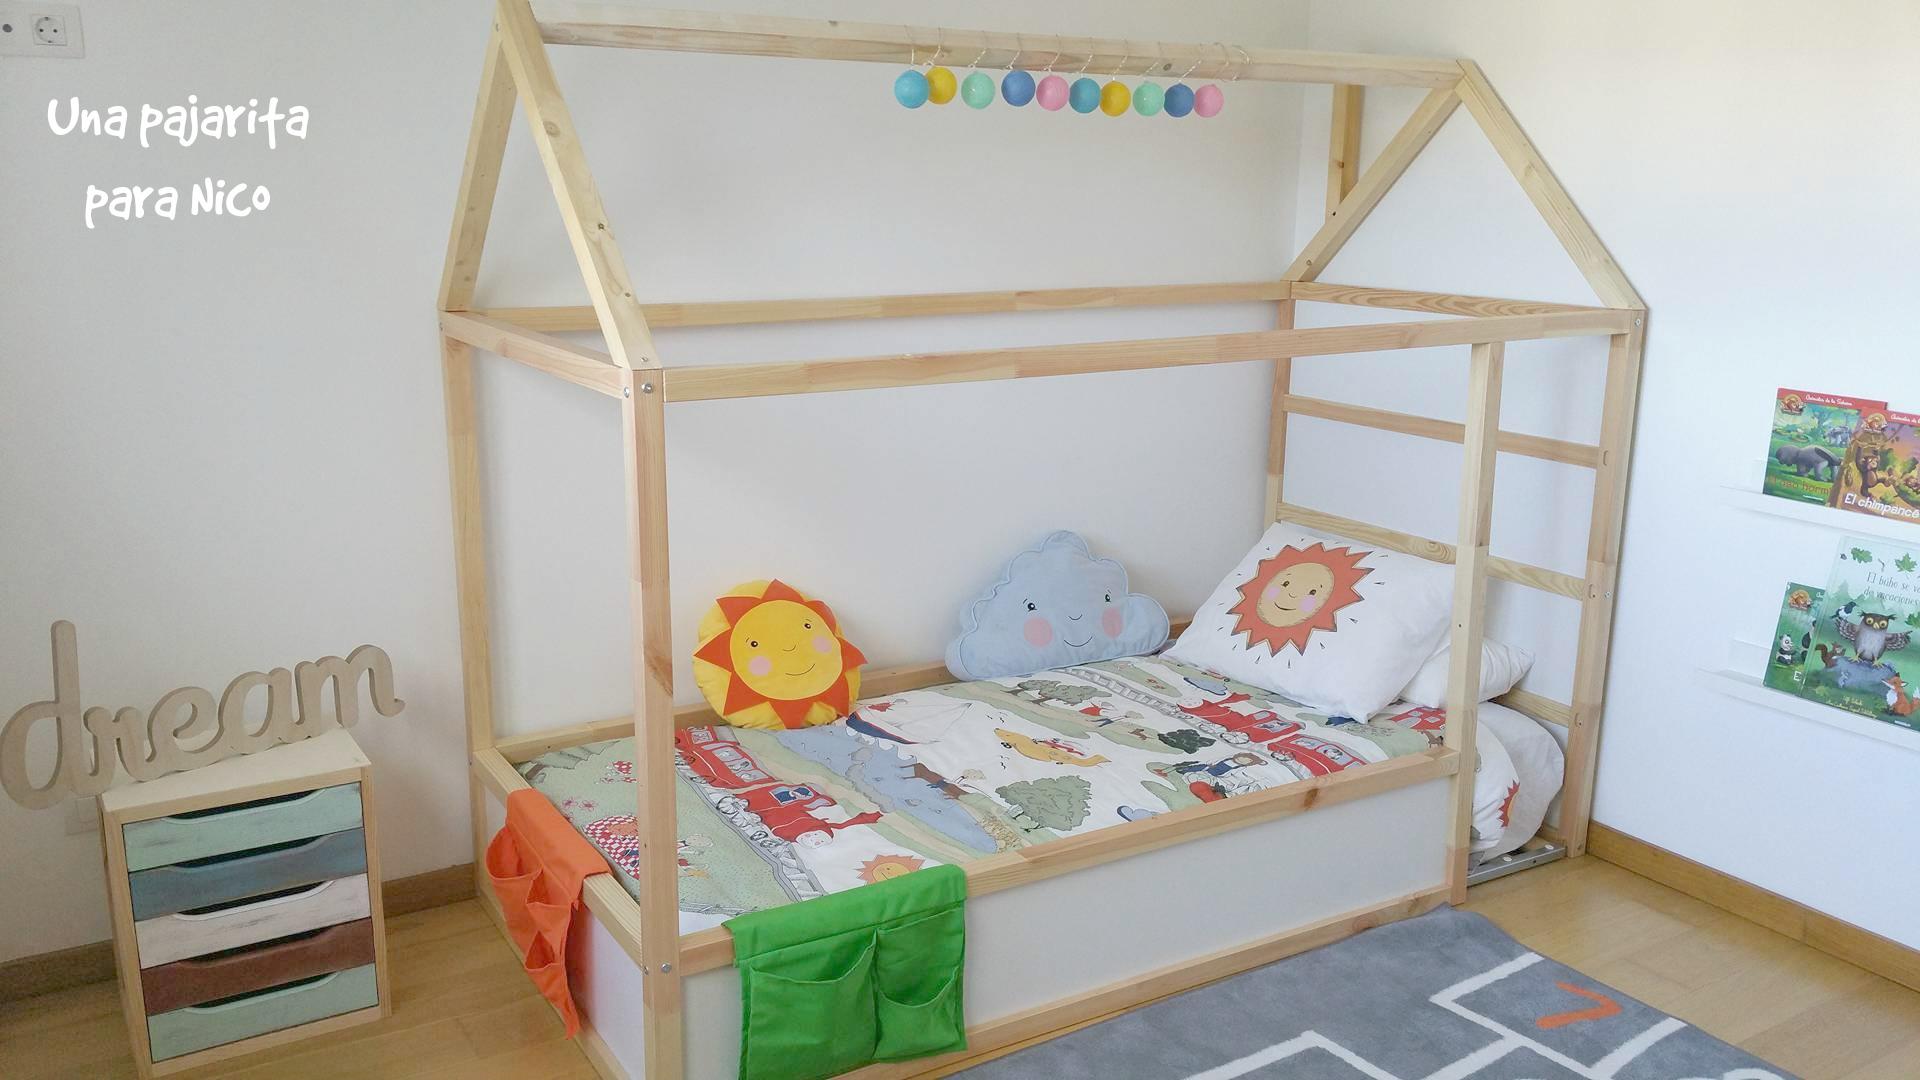 Diy Nico Montessori Con – Pajarita Casita Para Una Cama Kura WD92EHI